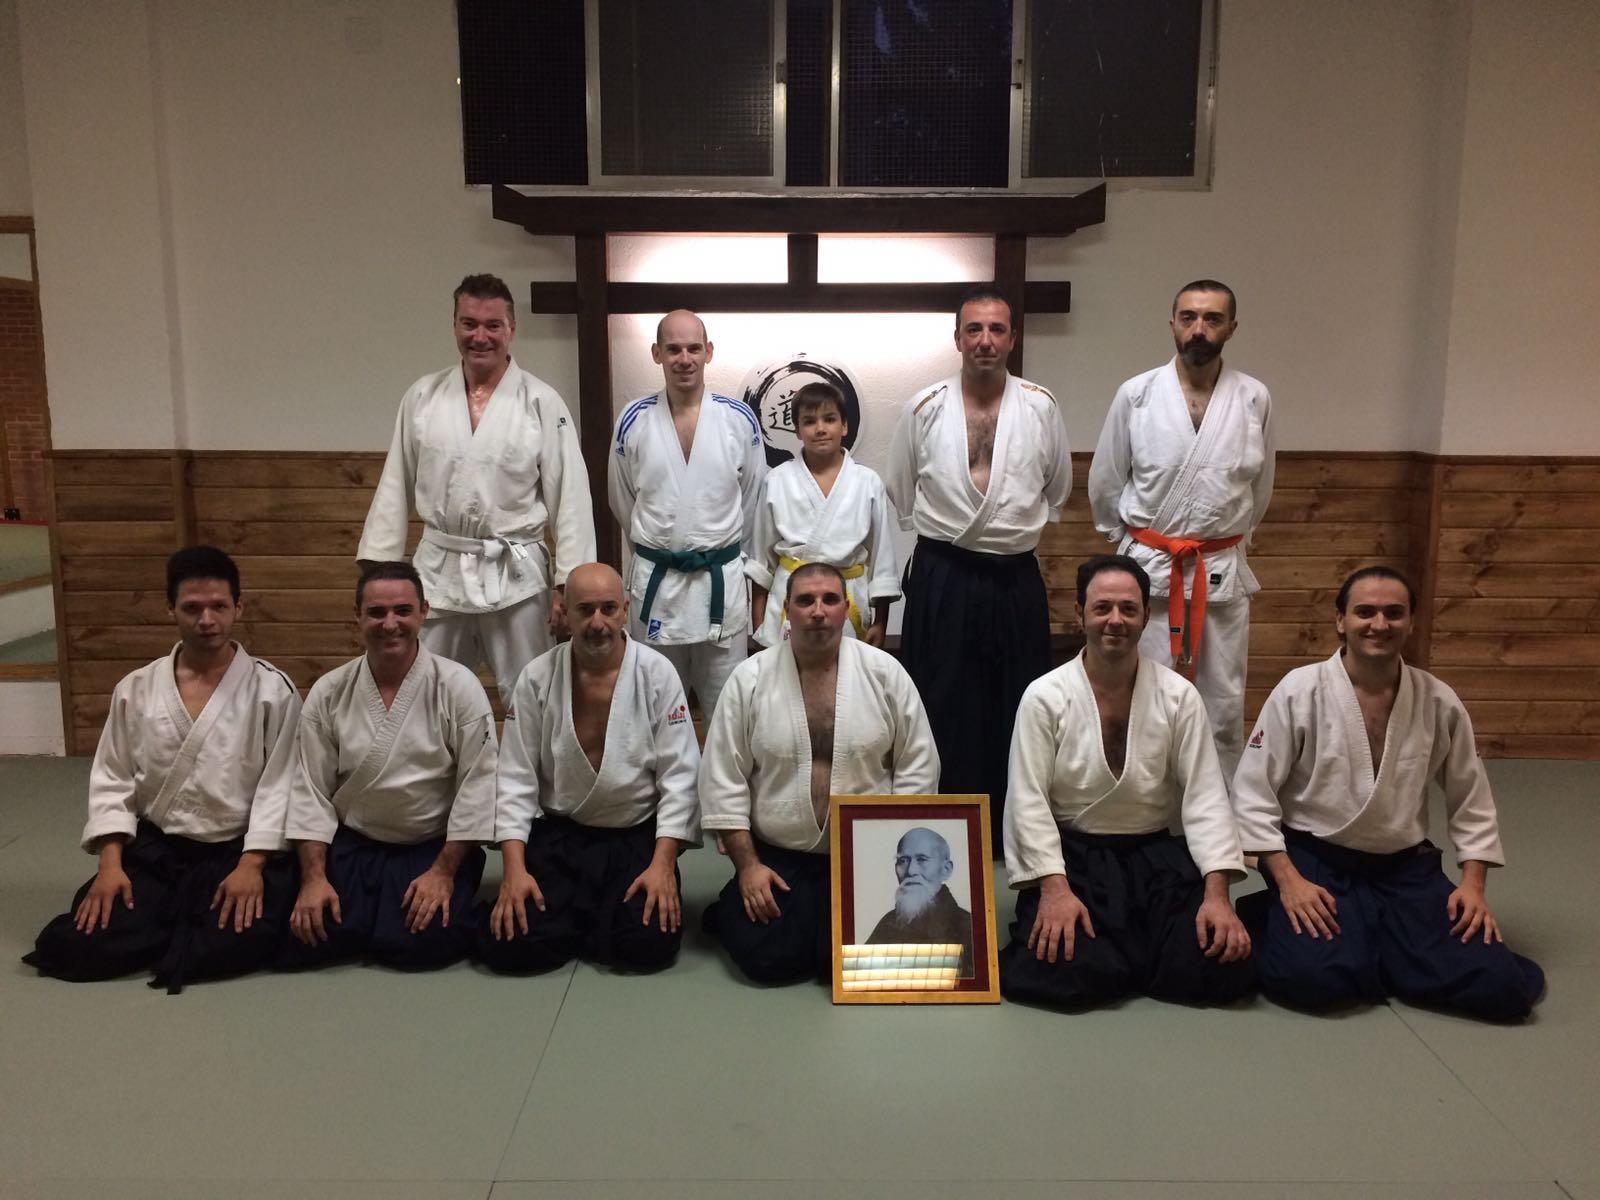 aikido villamadrid. clases de aikido madrid